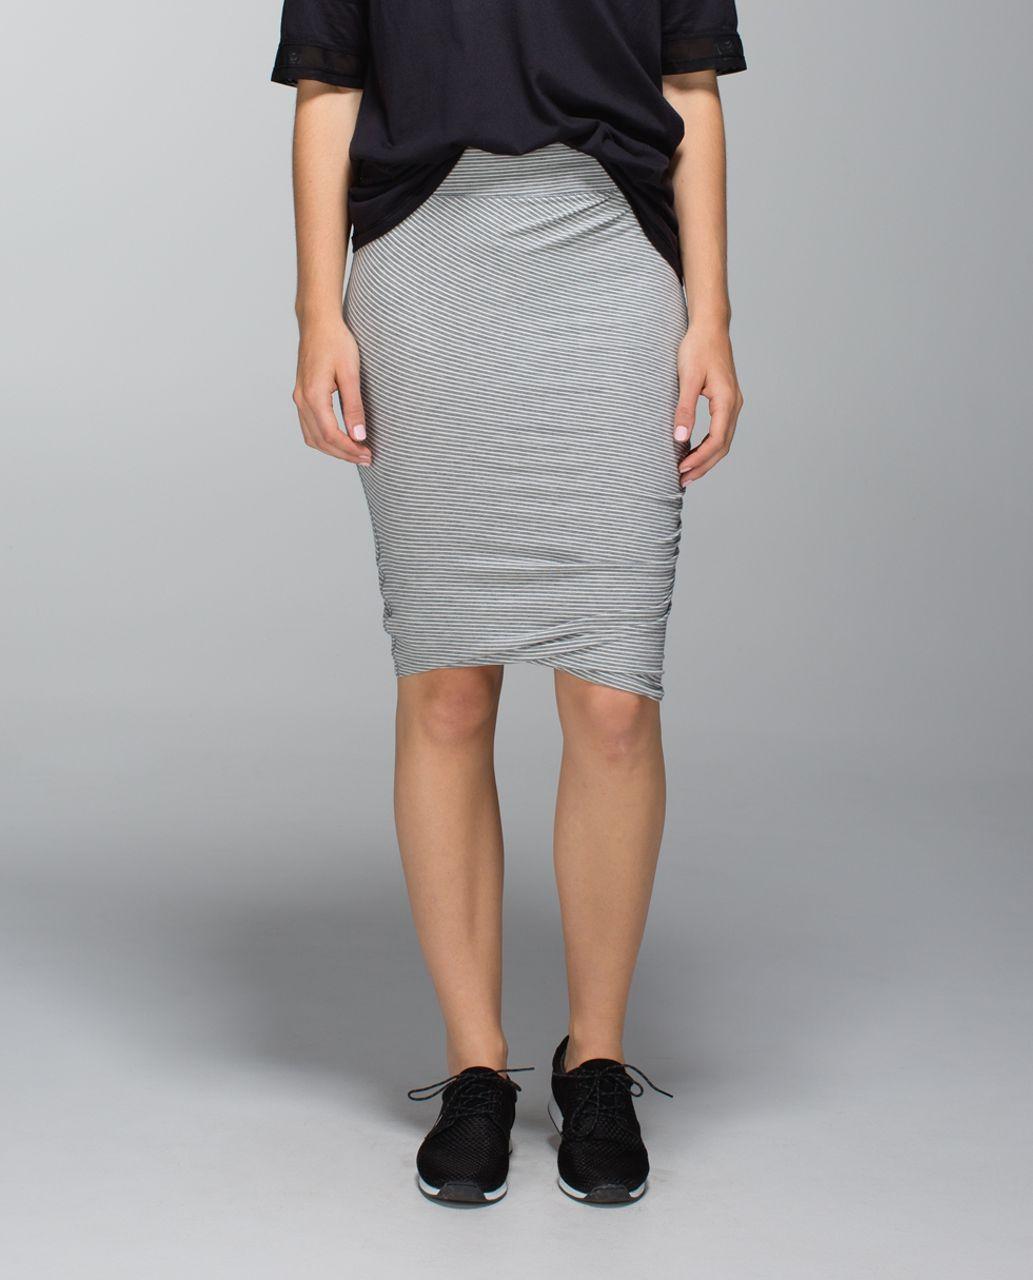 Lululemon Anytime Skirt - Hyper Stripe Heathered Medium Grey Ghost